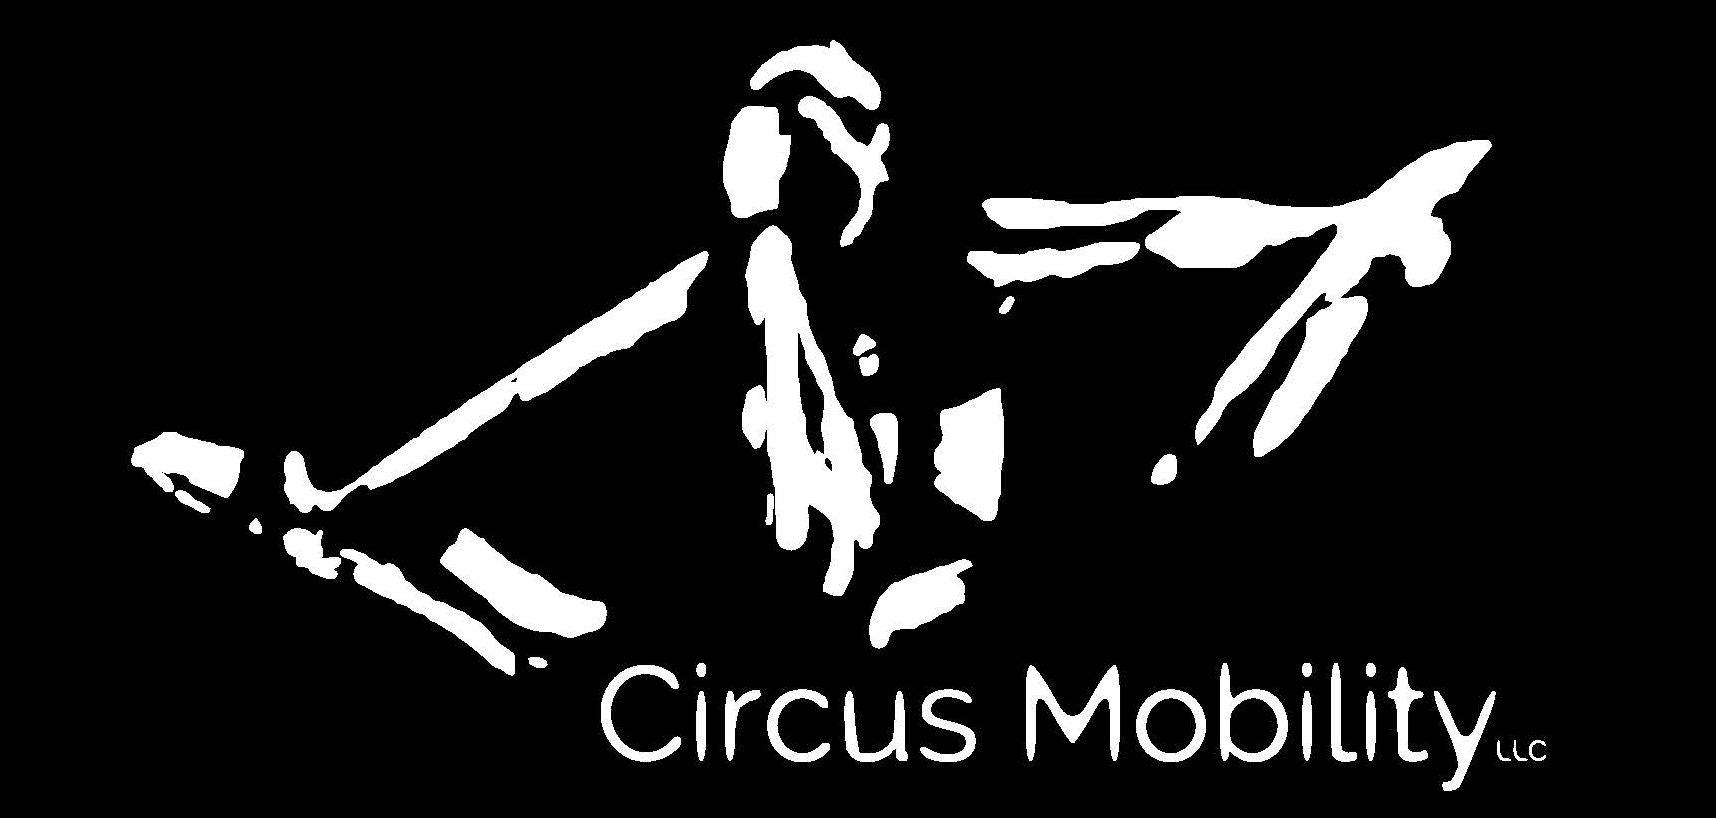 Circus Mobility LLC